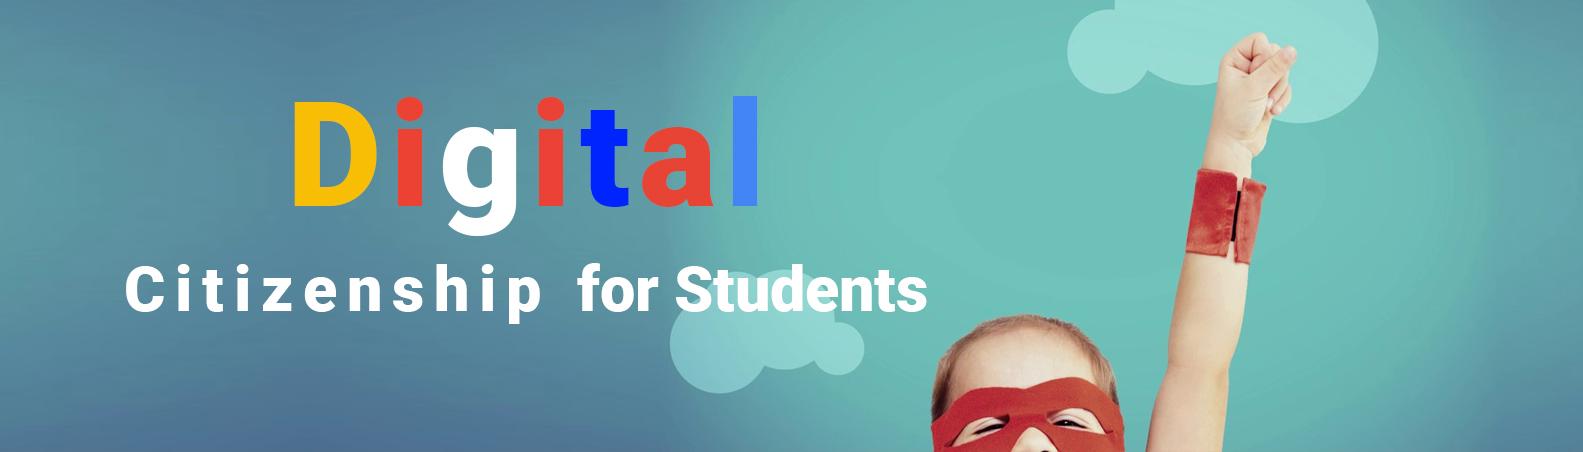 digital citizenship_students